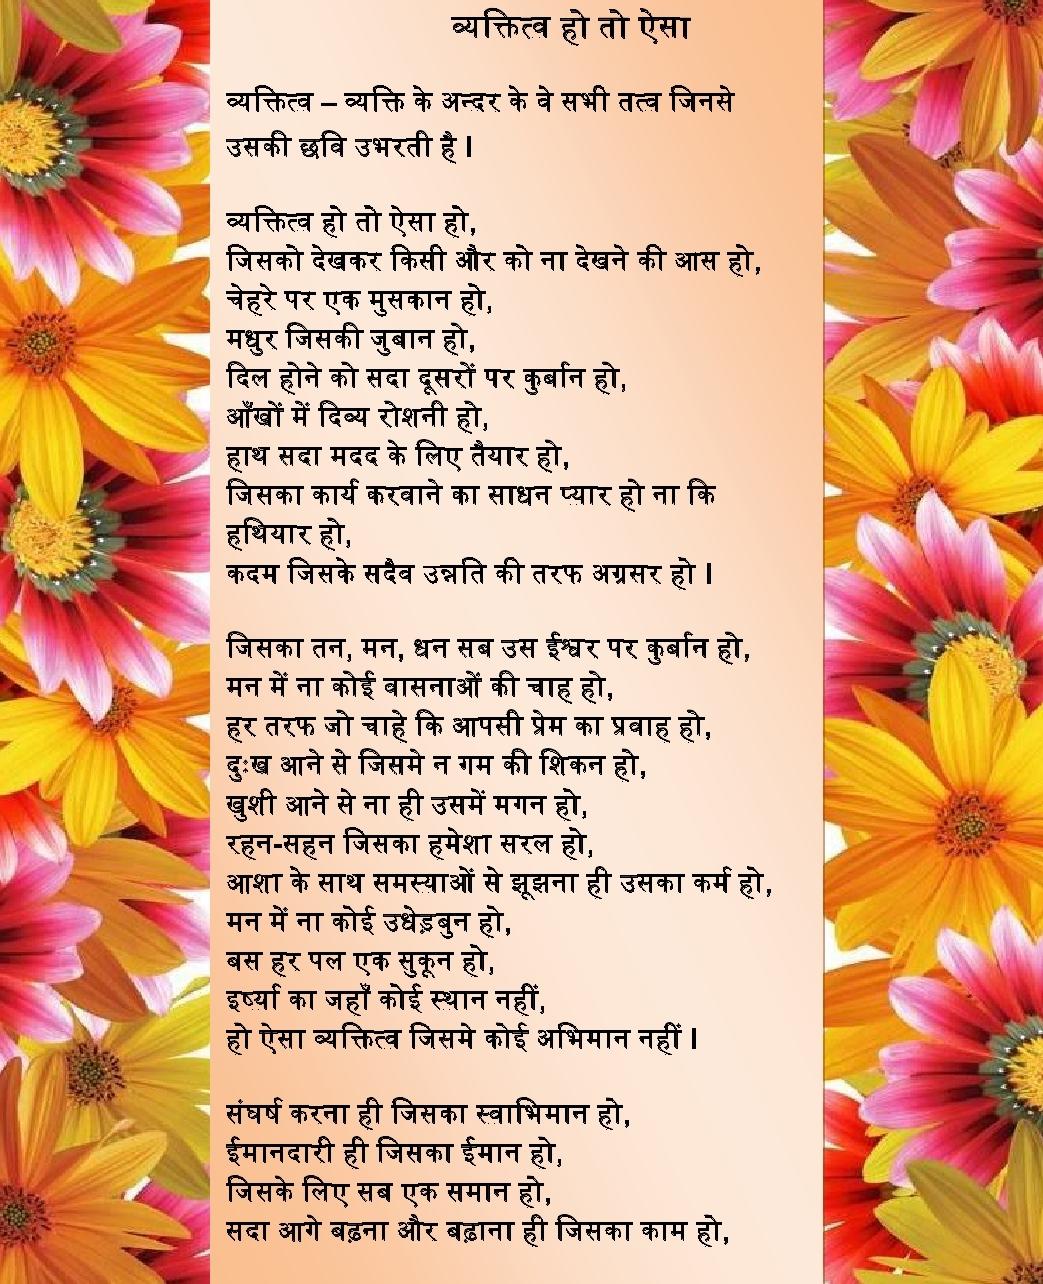 Indian Poetry Hindi Poems Reena Yadav Personality Should Be